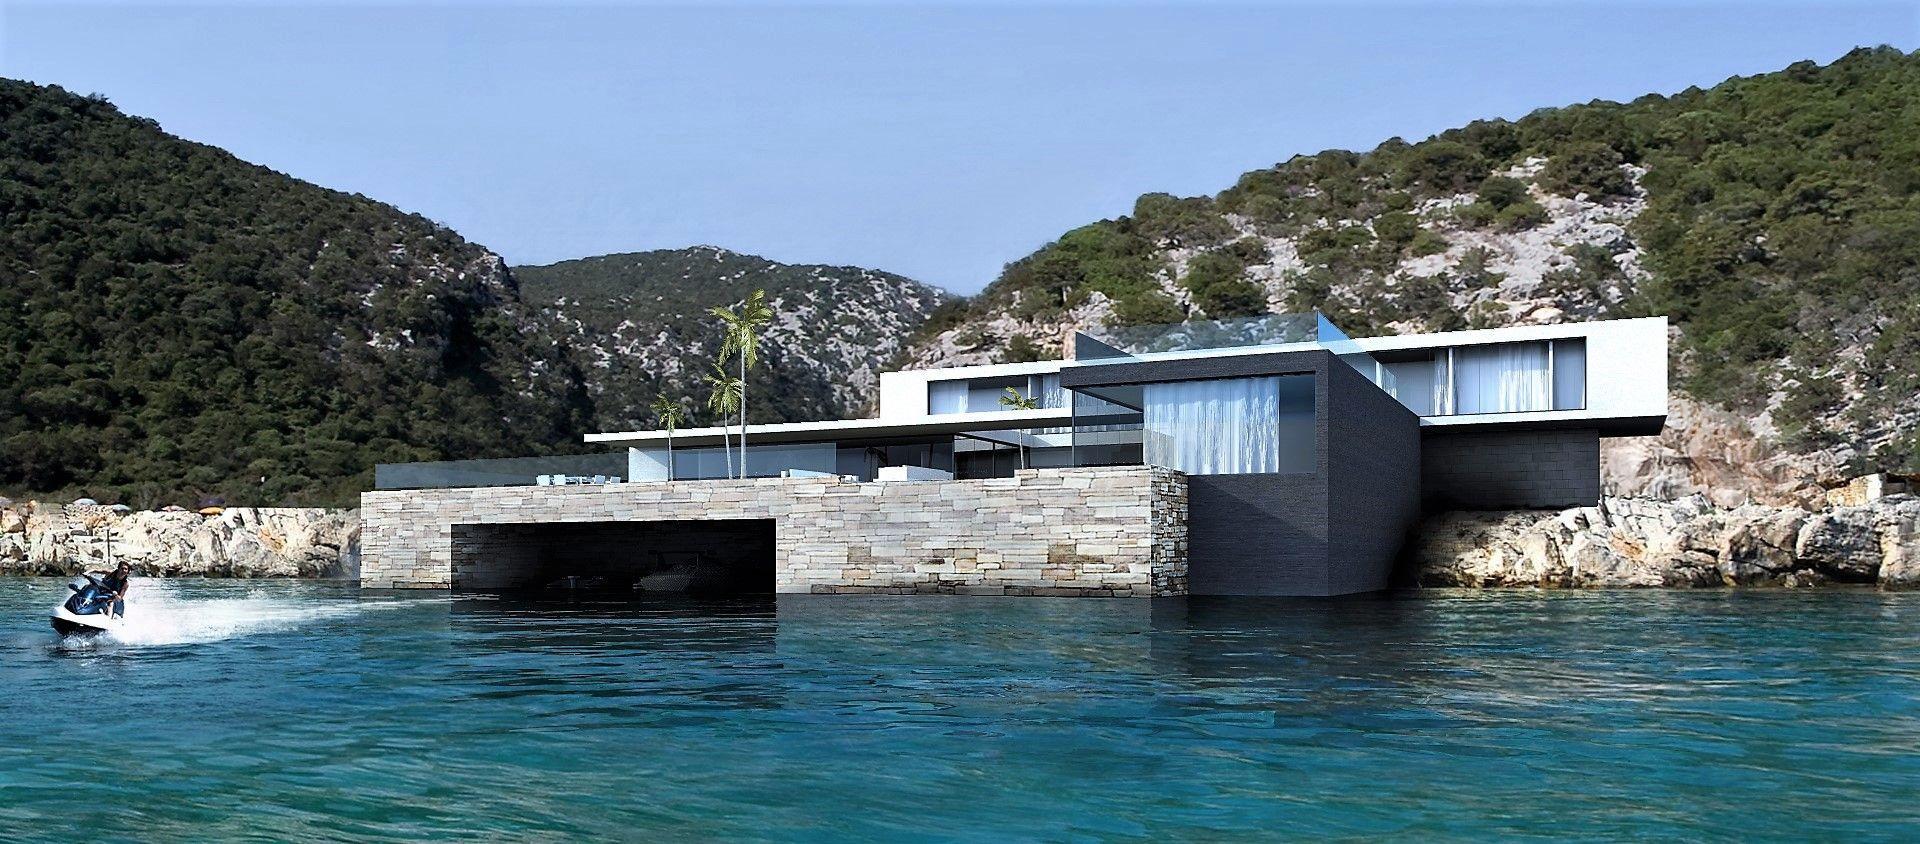 Maison Contemporaine Bord De Mer Architecte Cannes Villa